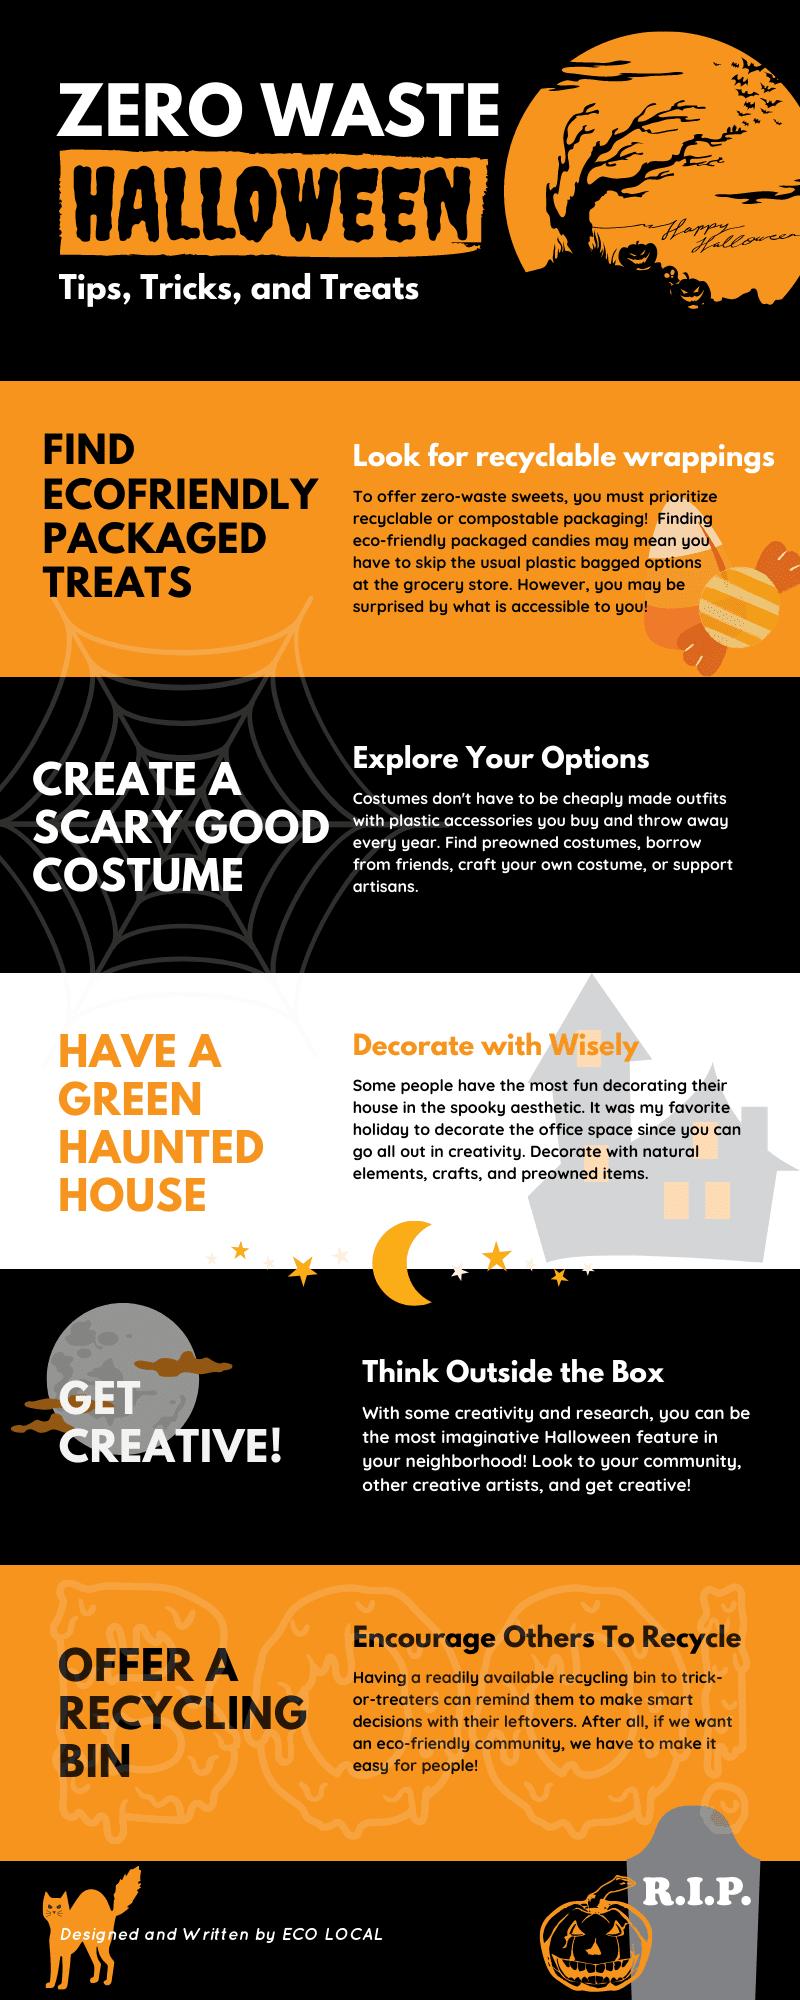 Zero Waste Halloween #infographic #Environment #Halloween #Zero Waste